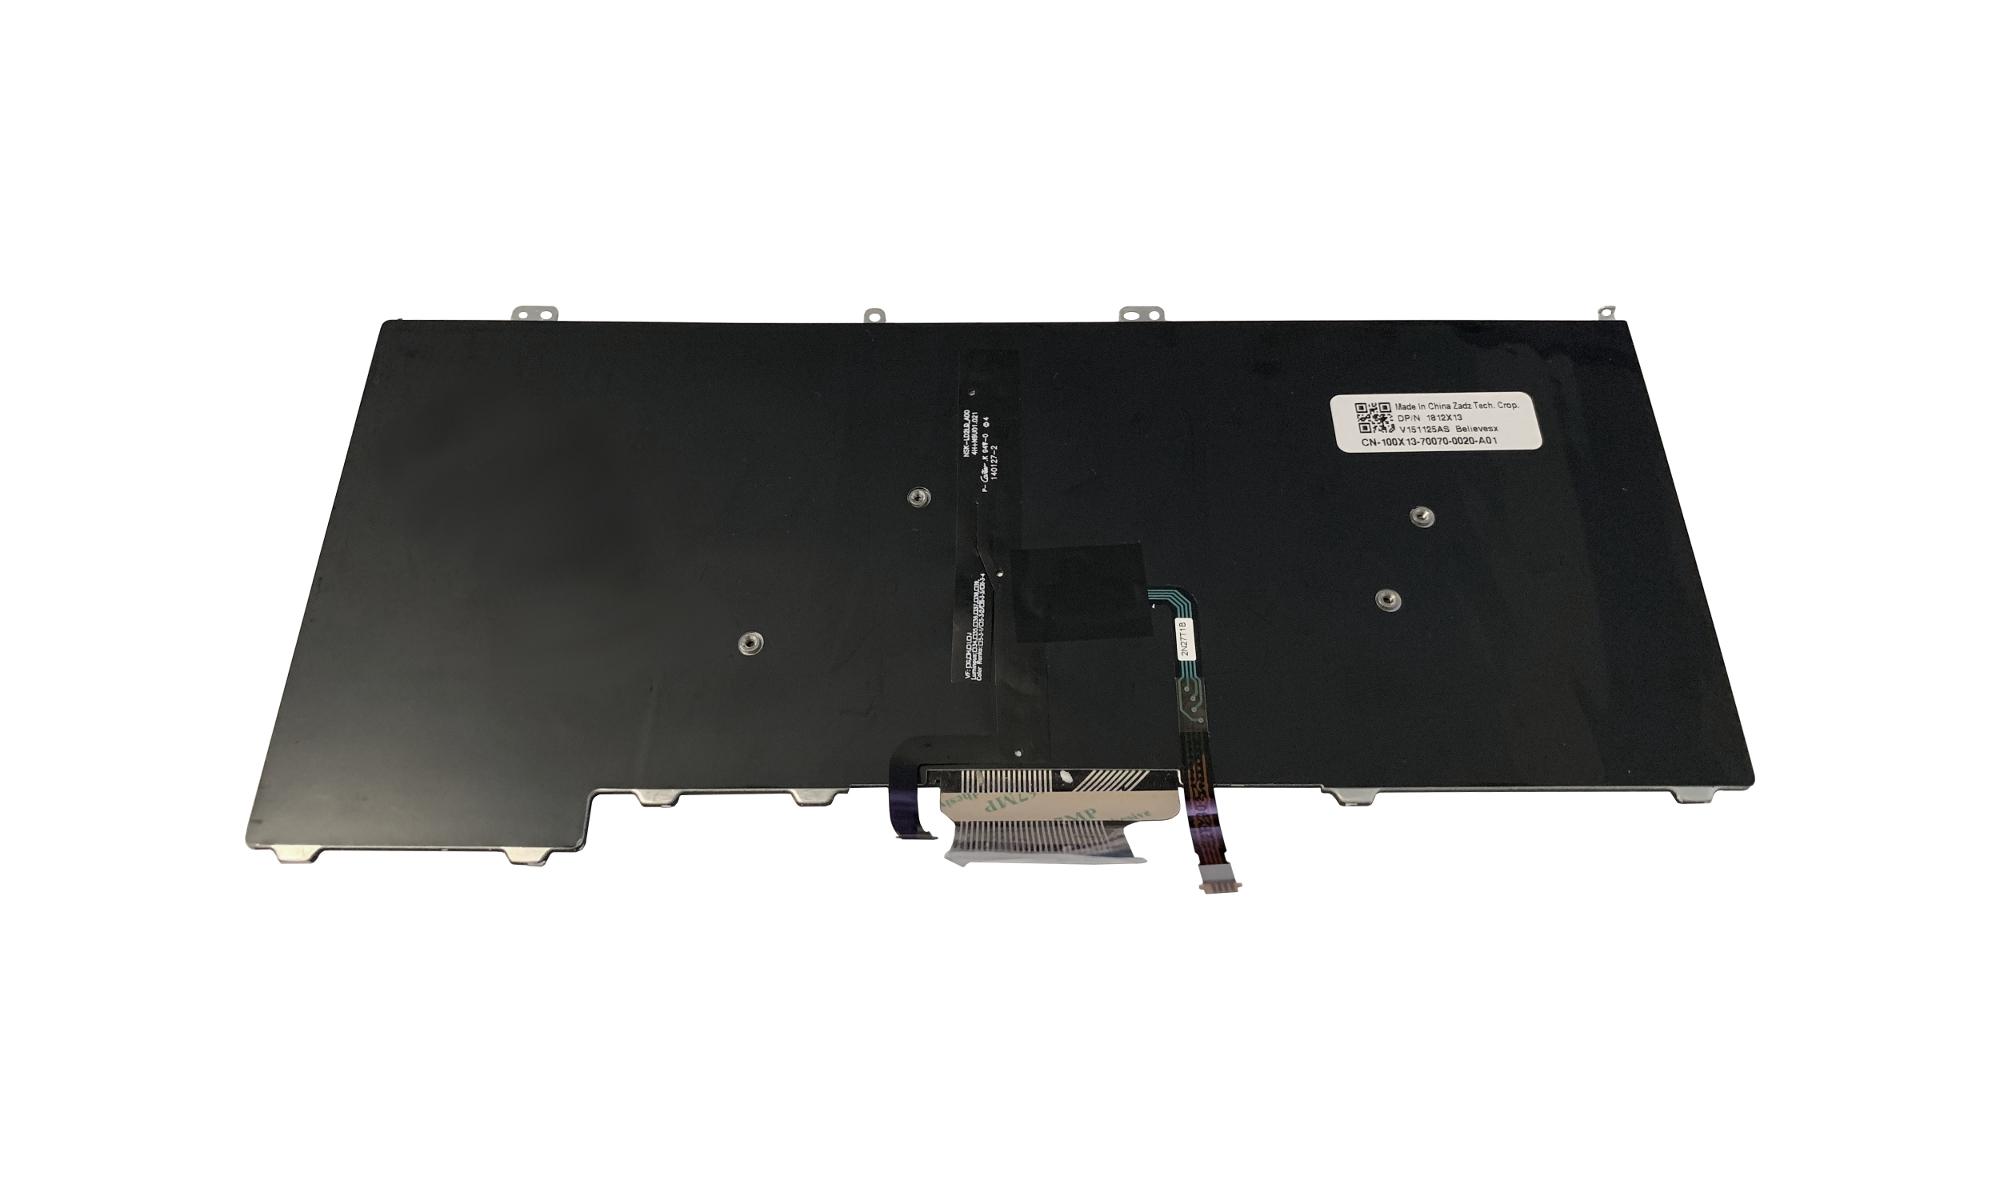 Tastatura compatibila Dell Latitude E7440 iluminata, layout US, cu trackpoint